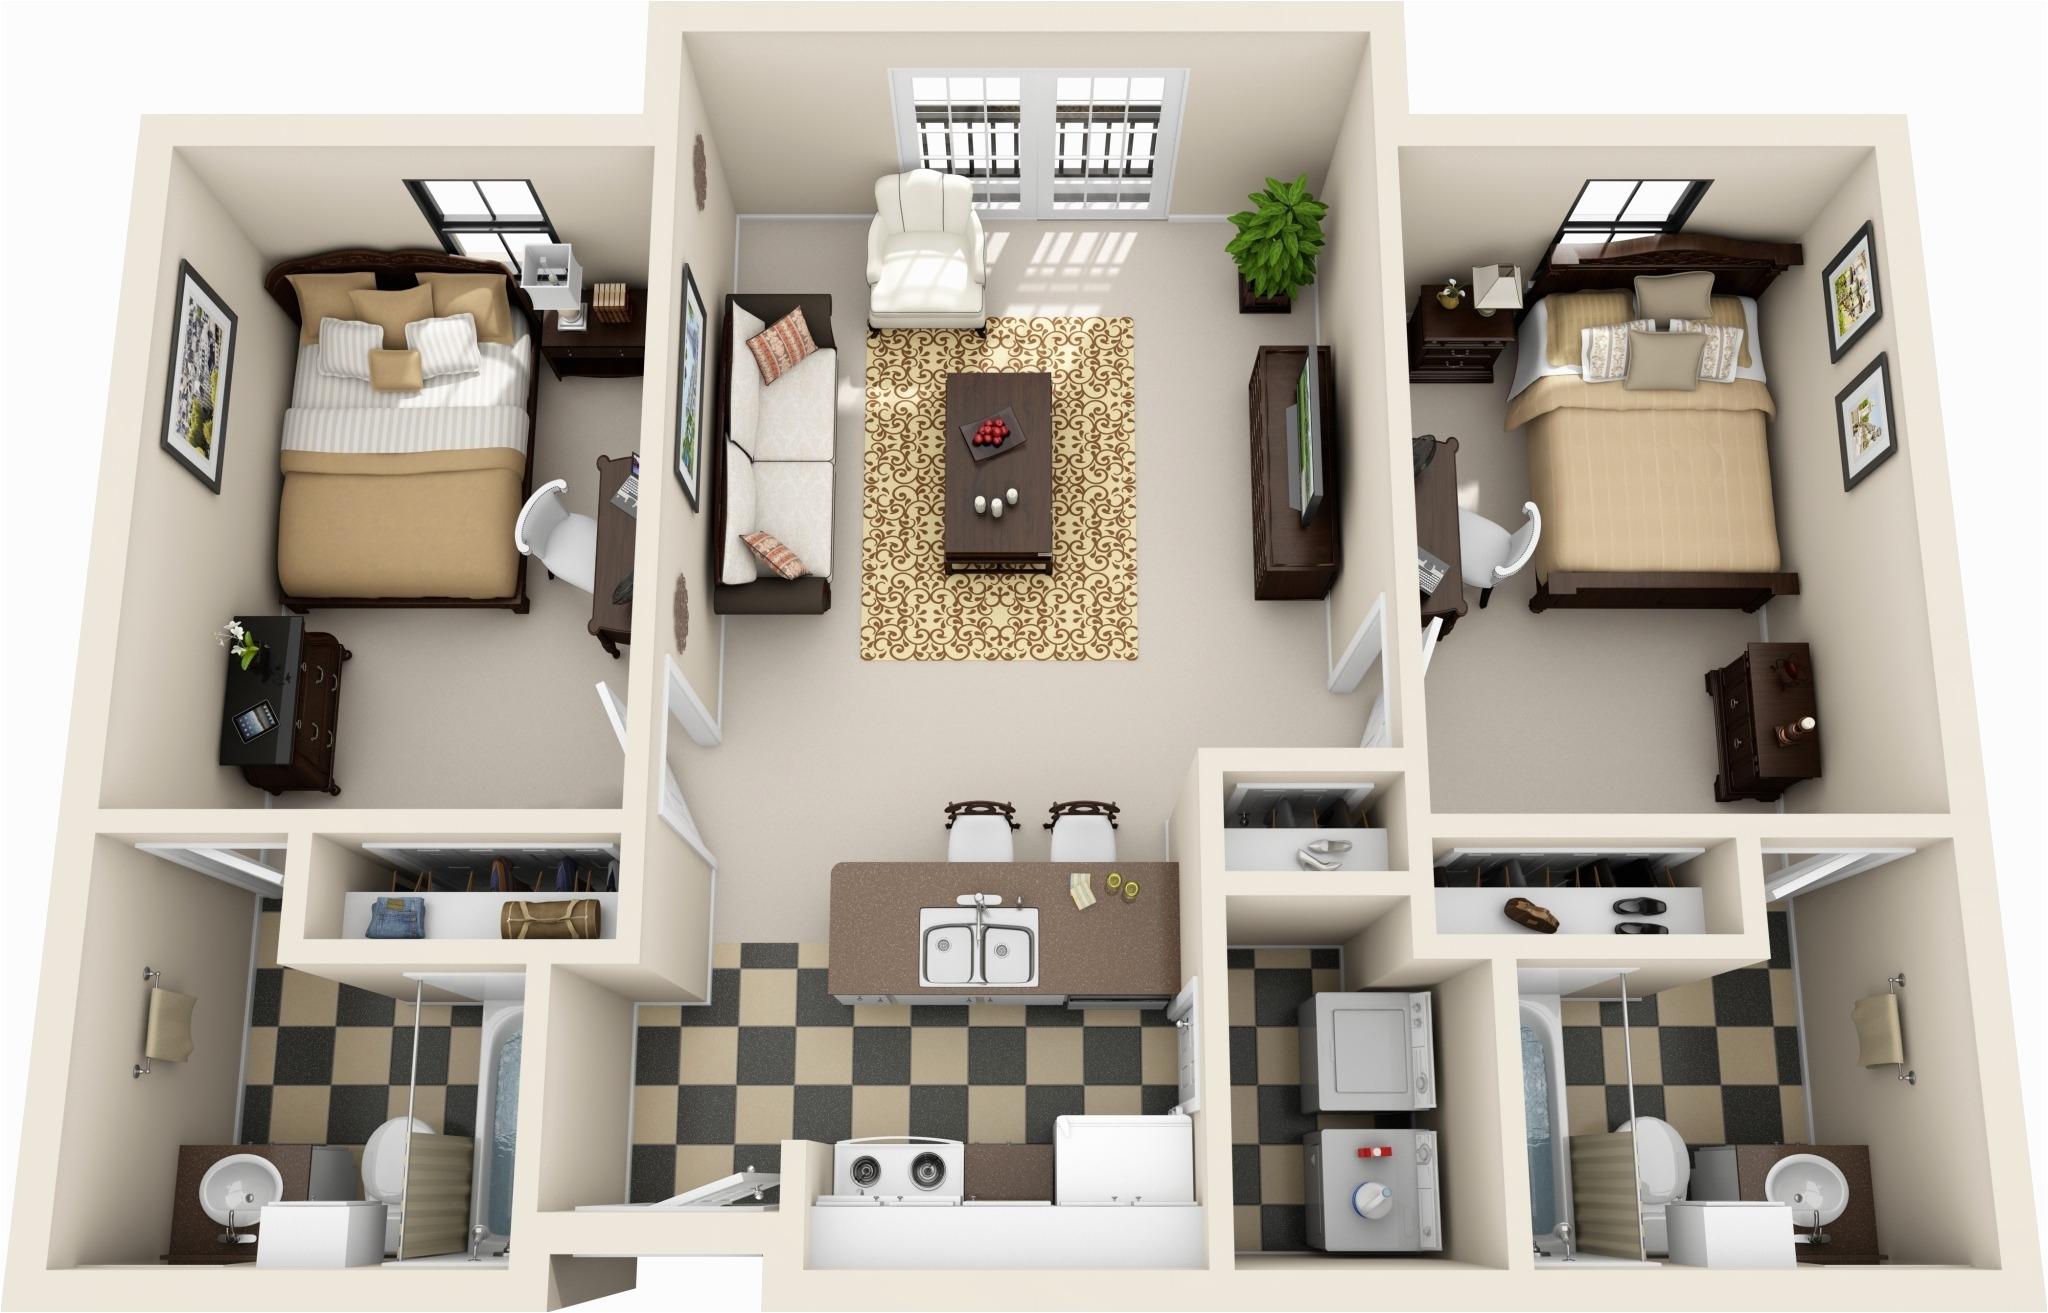 1 Bedroom Apartments In Baton Rouge Louisiana 12 2 Bedroom Apartments  Review Best Bedroom Design Ideas